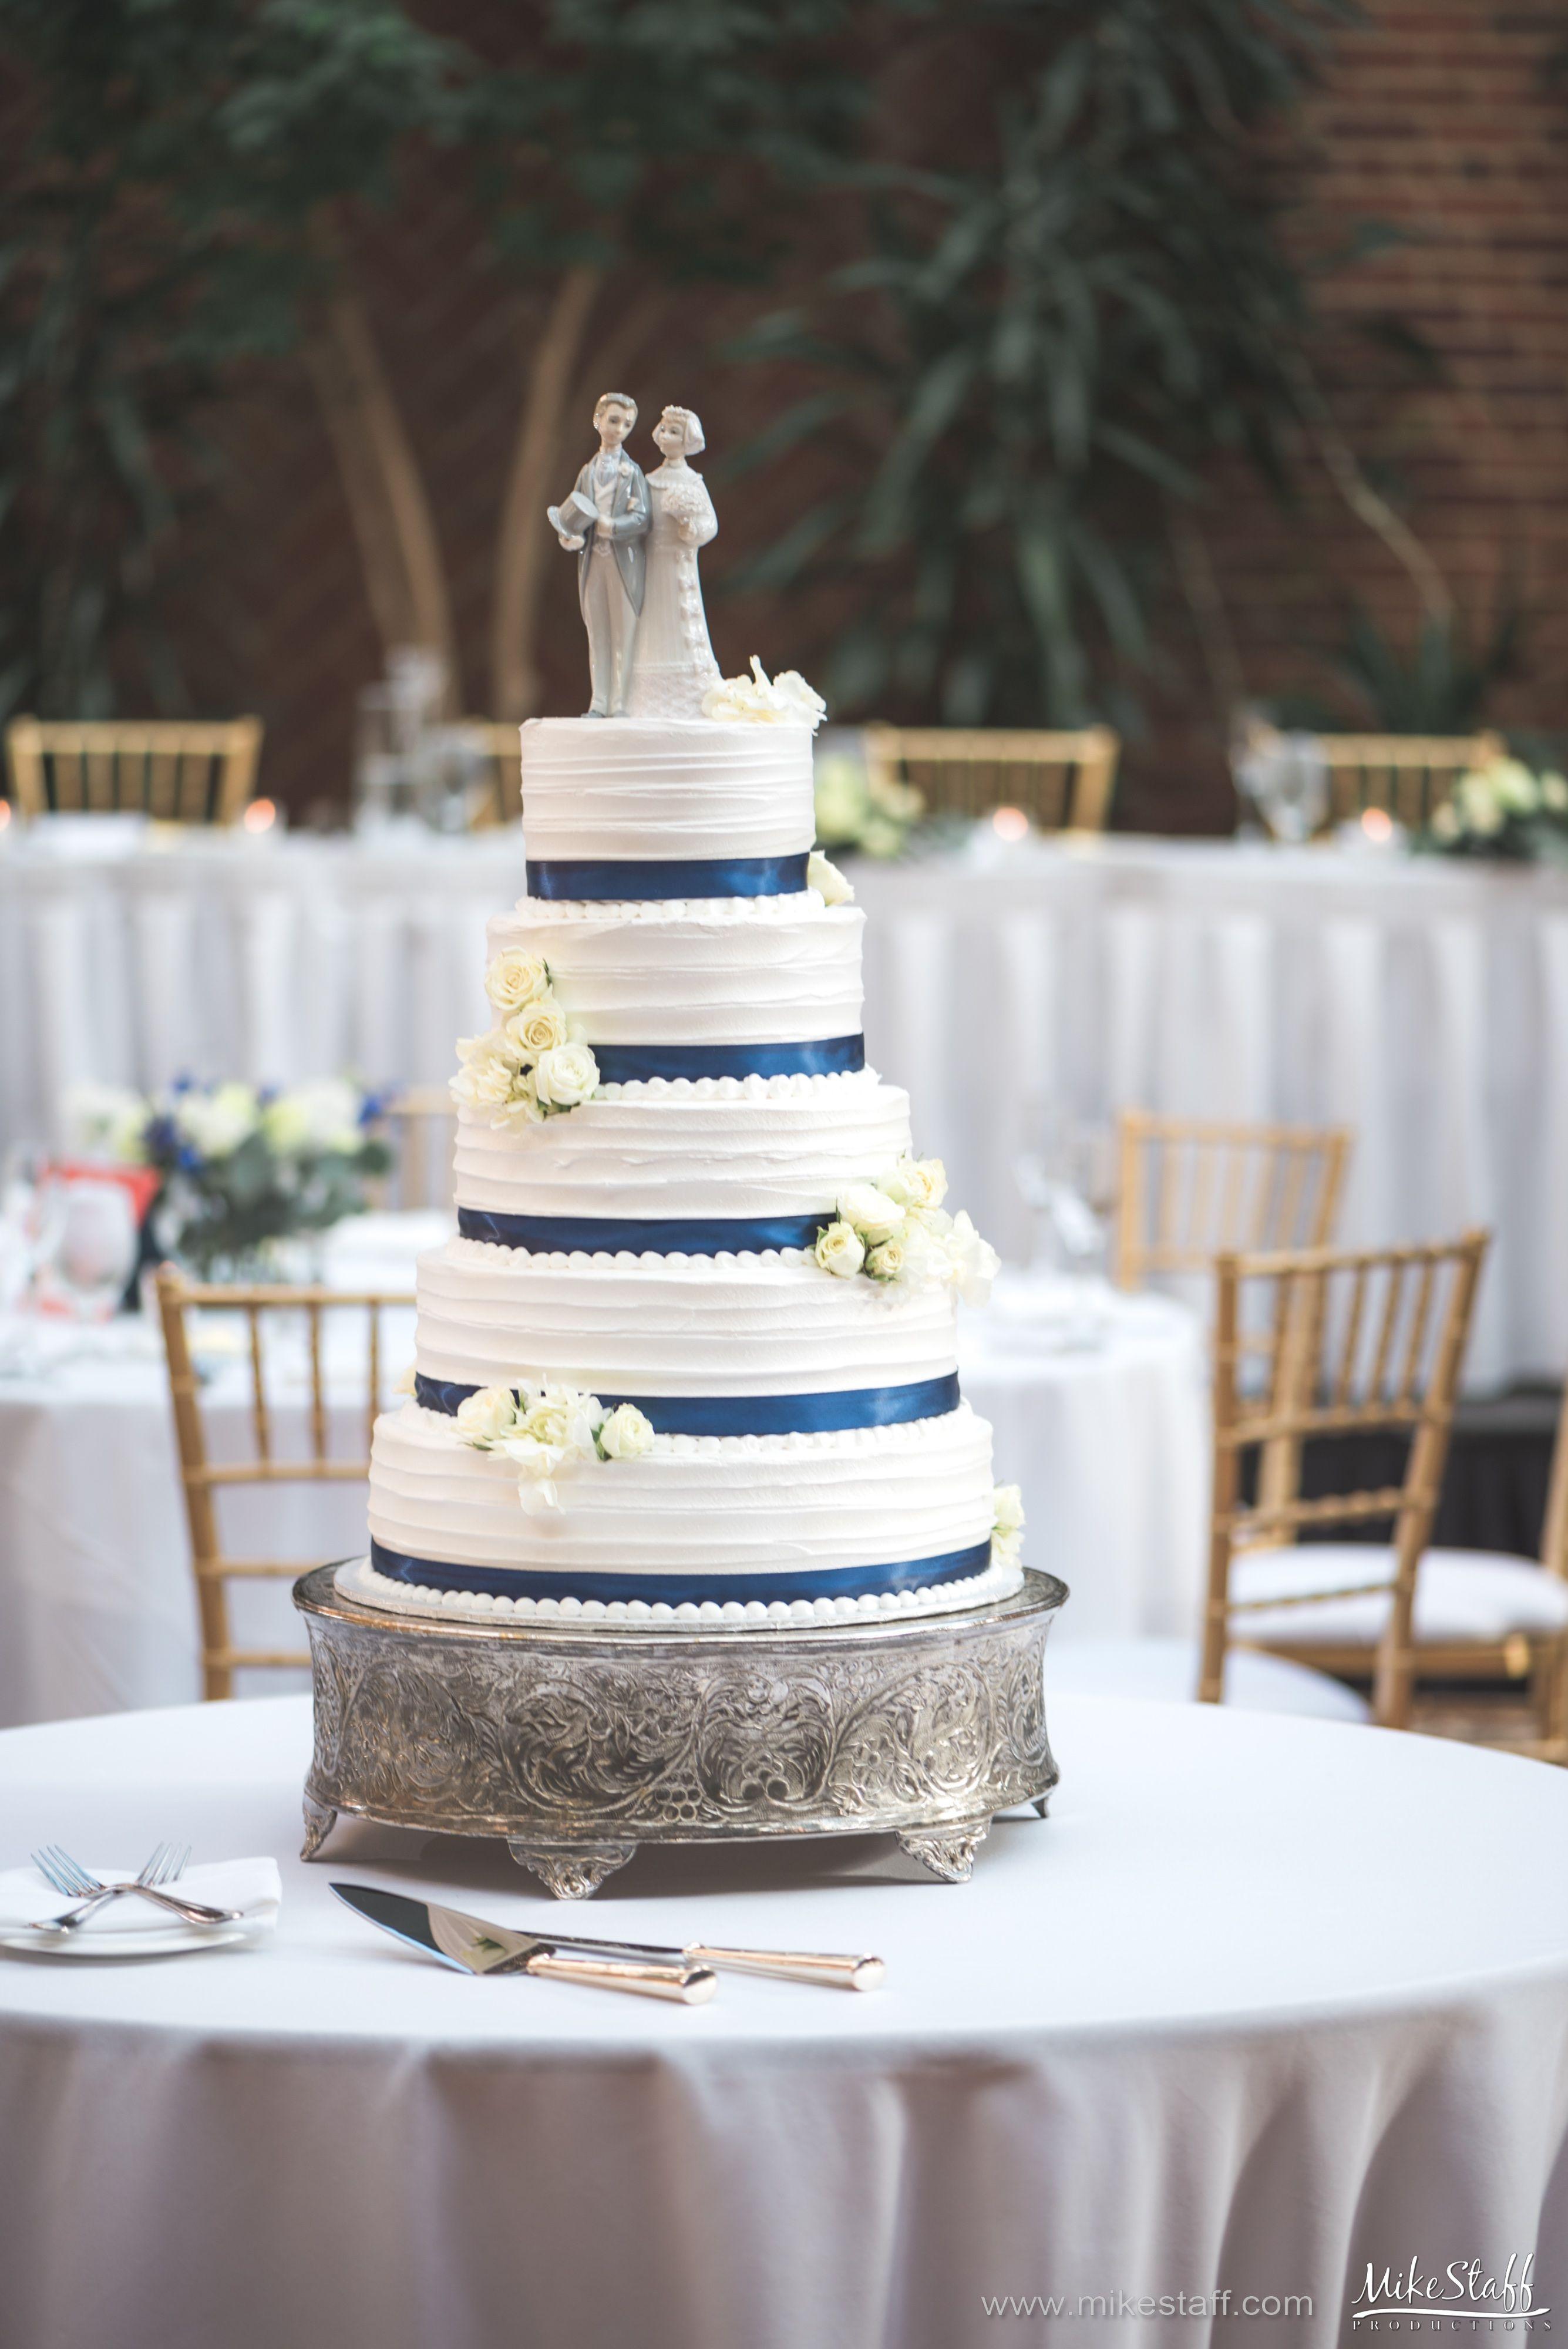 15+ Baby cakes bakery detroit ideas in 2021